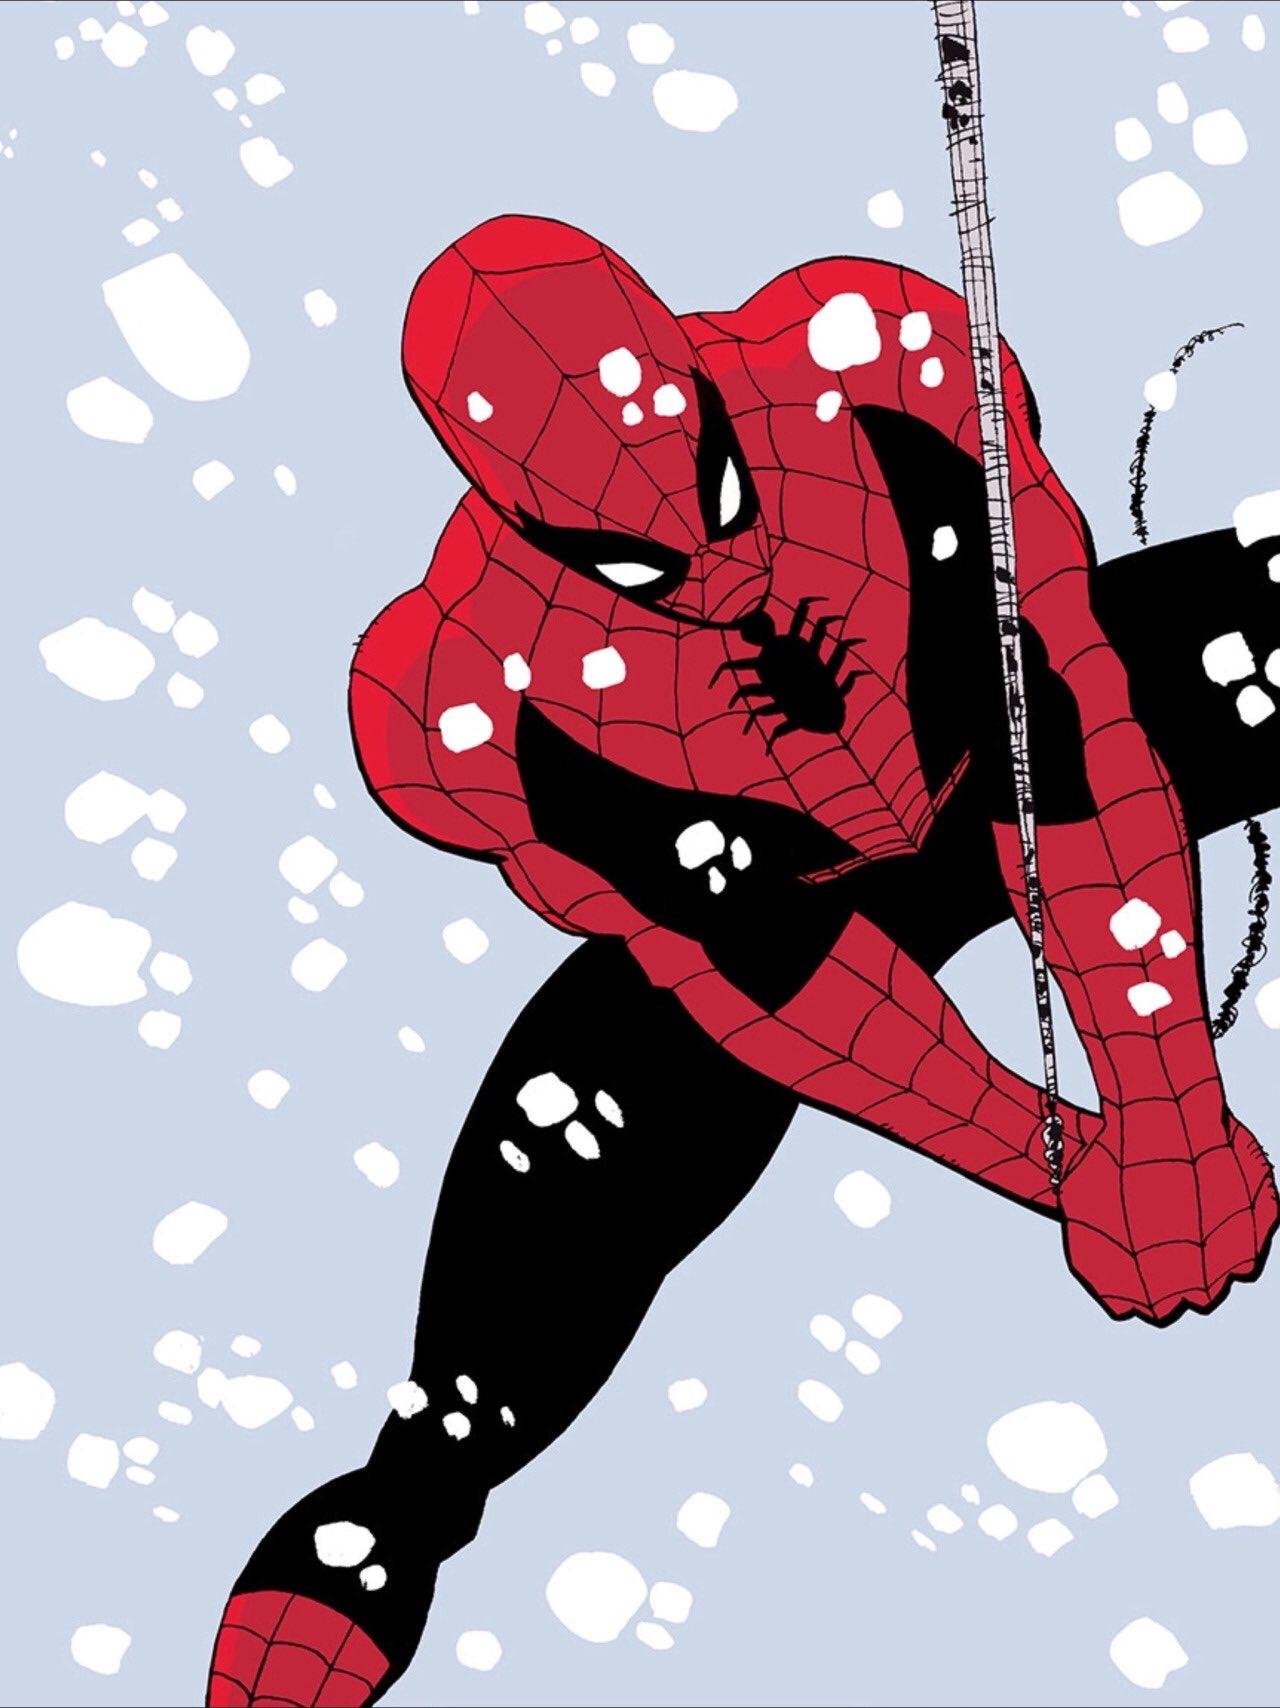 Tim Sale Spiderman, Comic book artwork, Spectacular